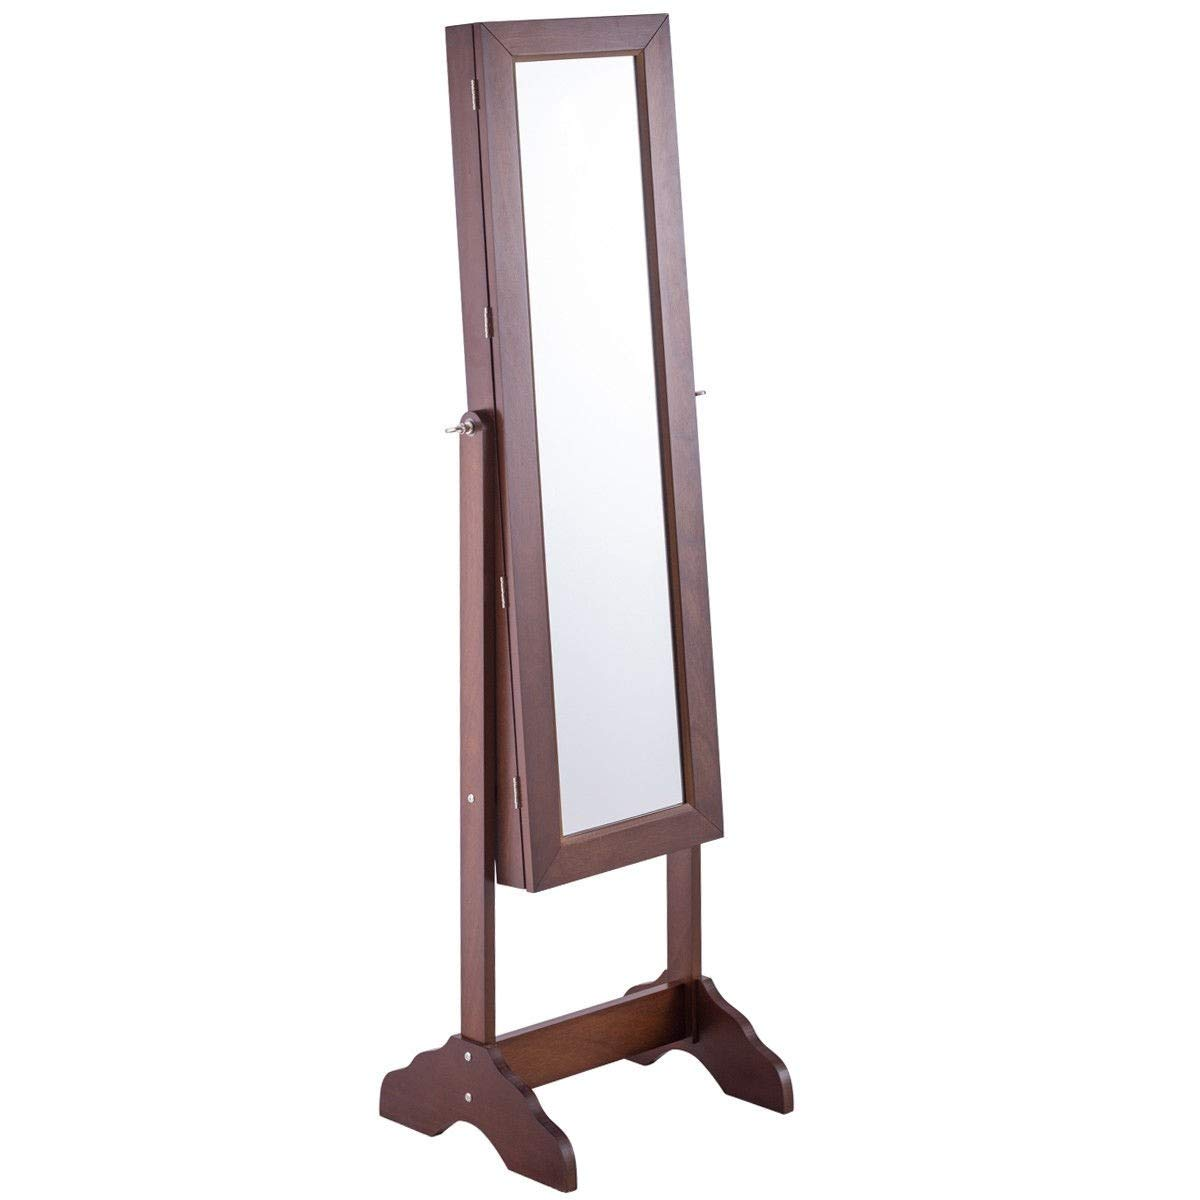 WATERJOY Jewelry Cabinet Armoire with Mirror Lockable Jewelry Holder Organizer Storage Freestanding